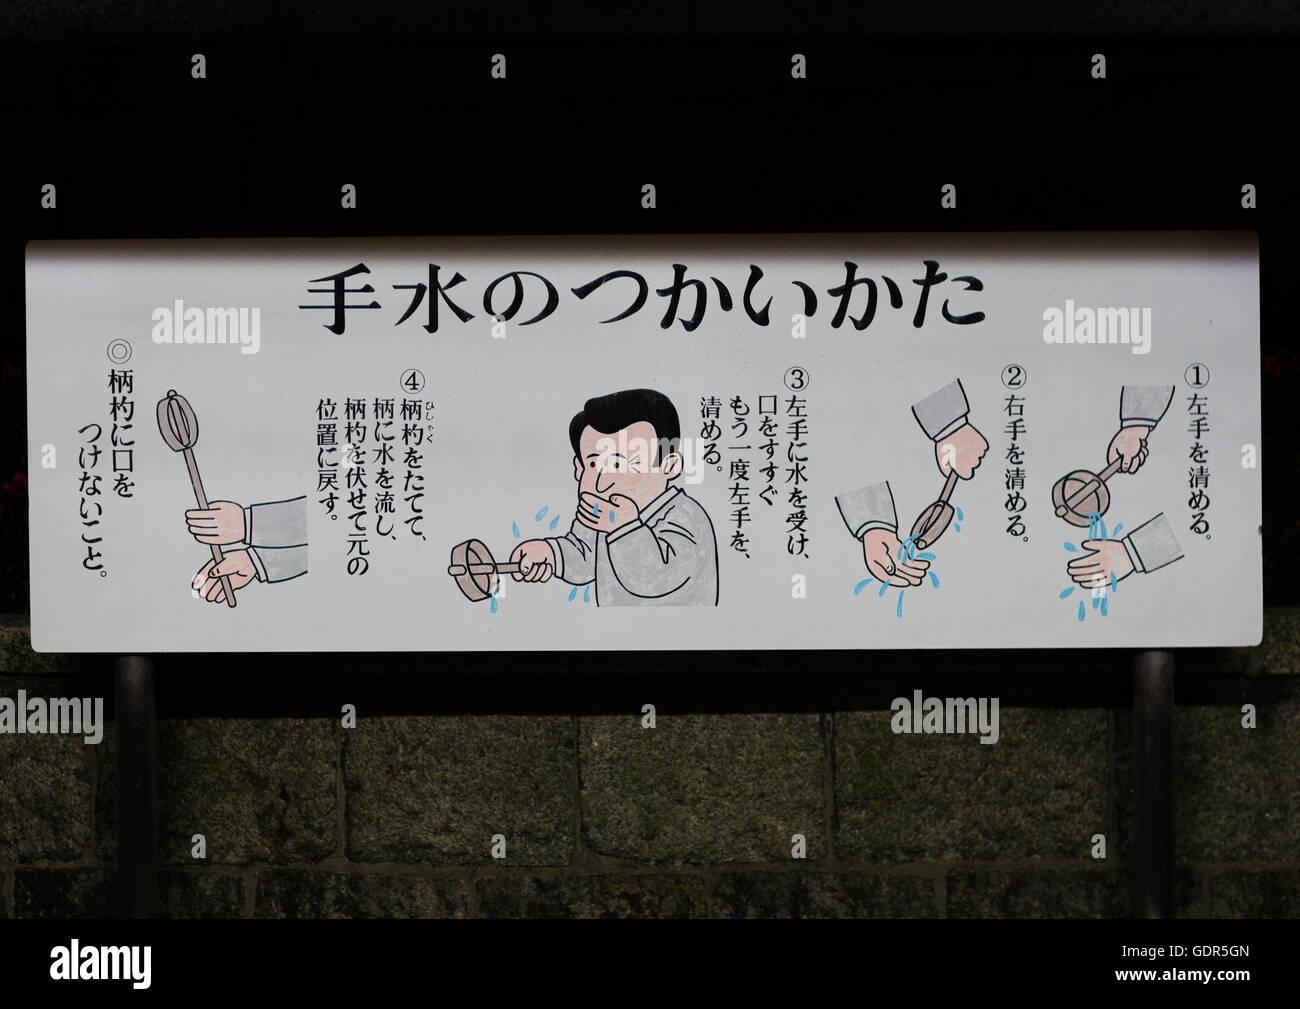 Instructions about use of water in in fushimi inari-taisha, Kansai region, Kyoto, Japan - Stock Image